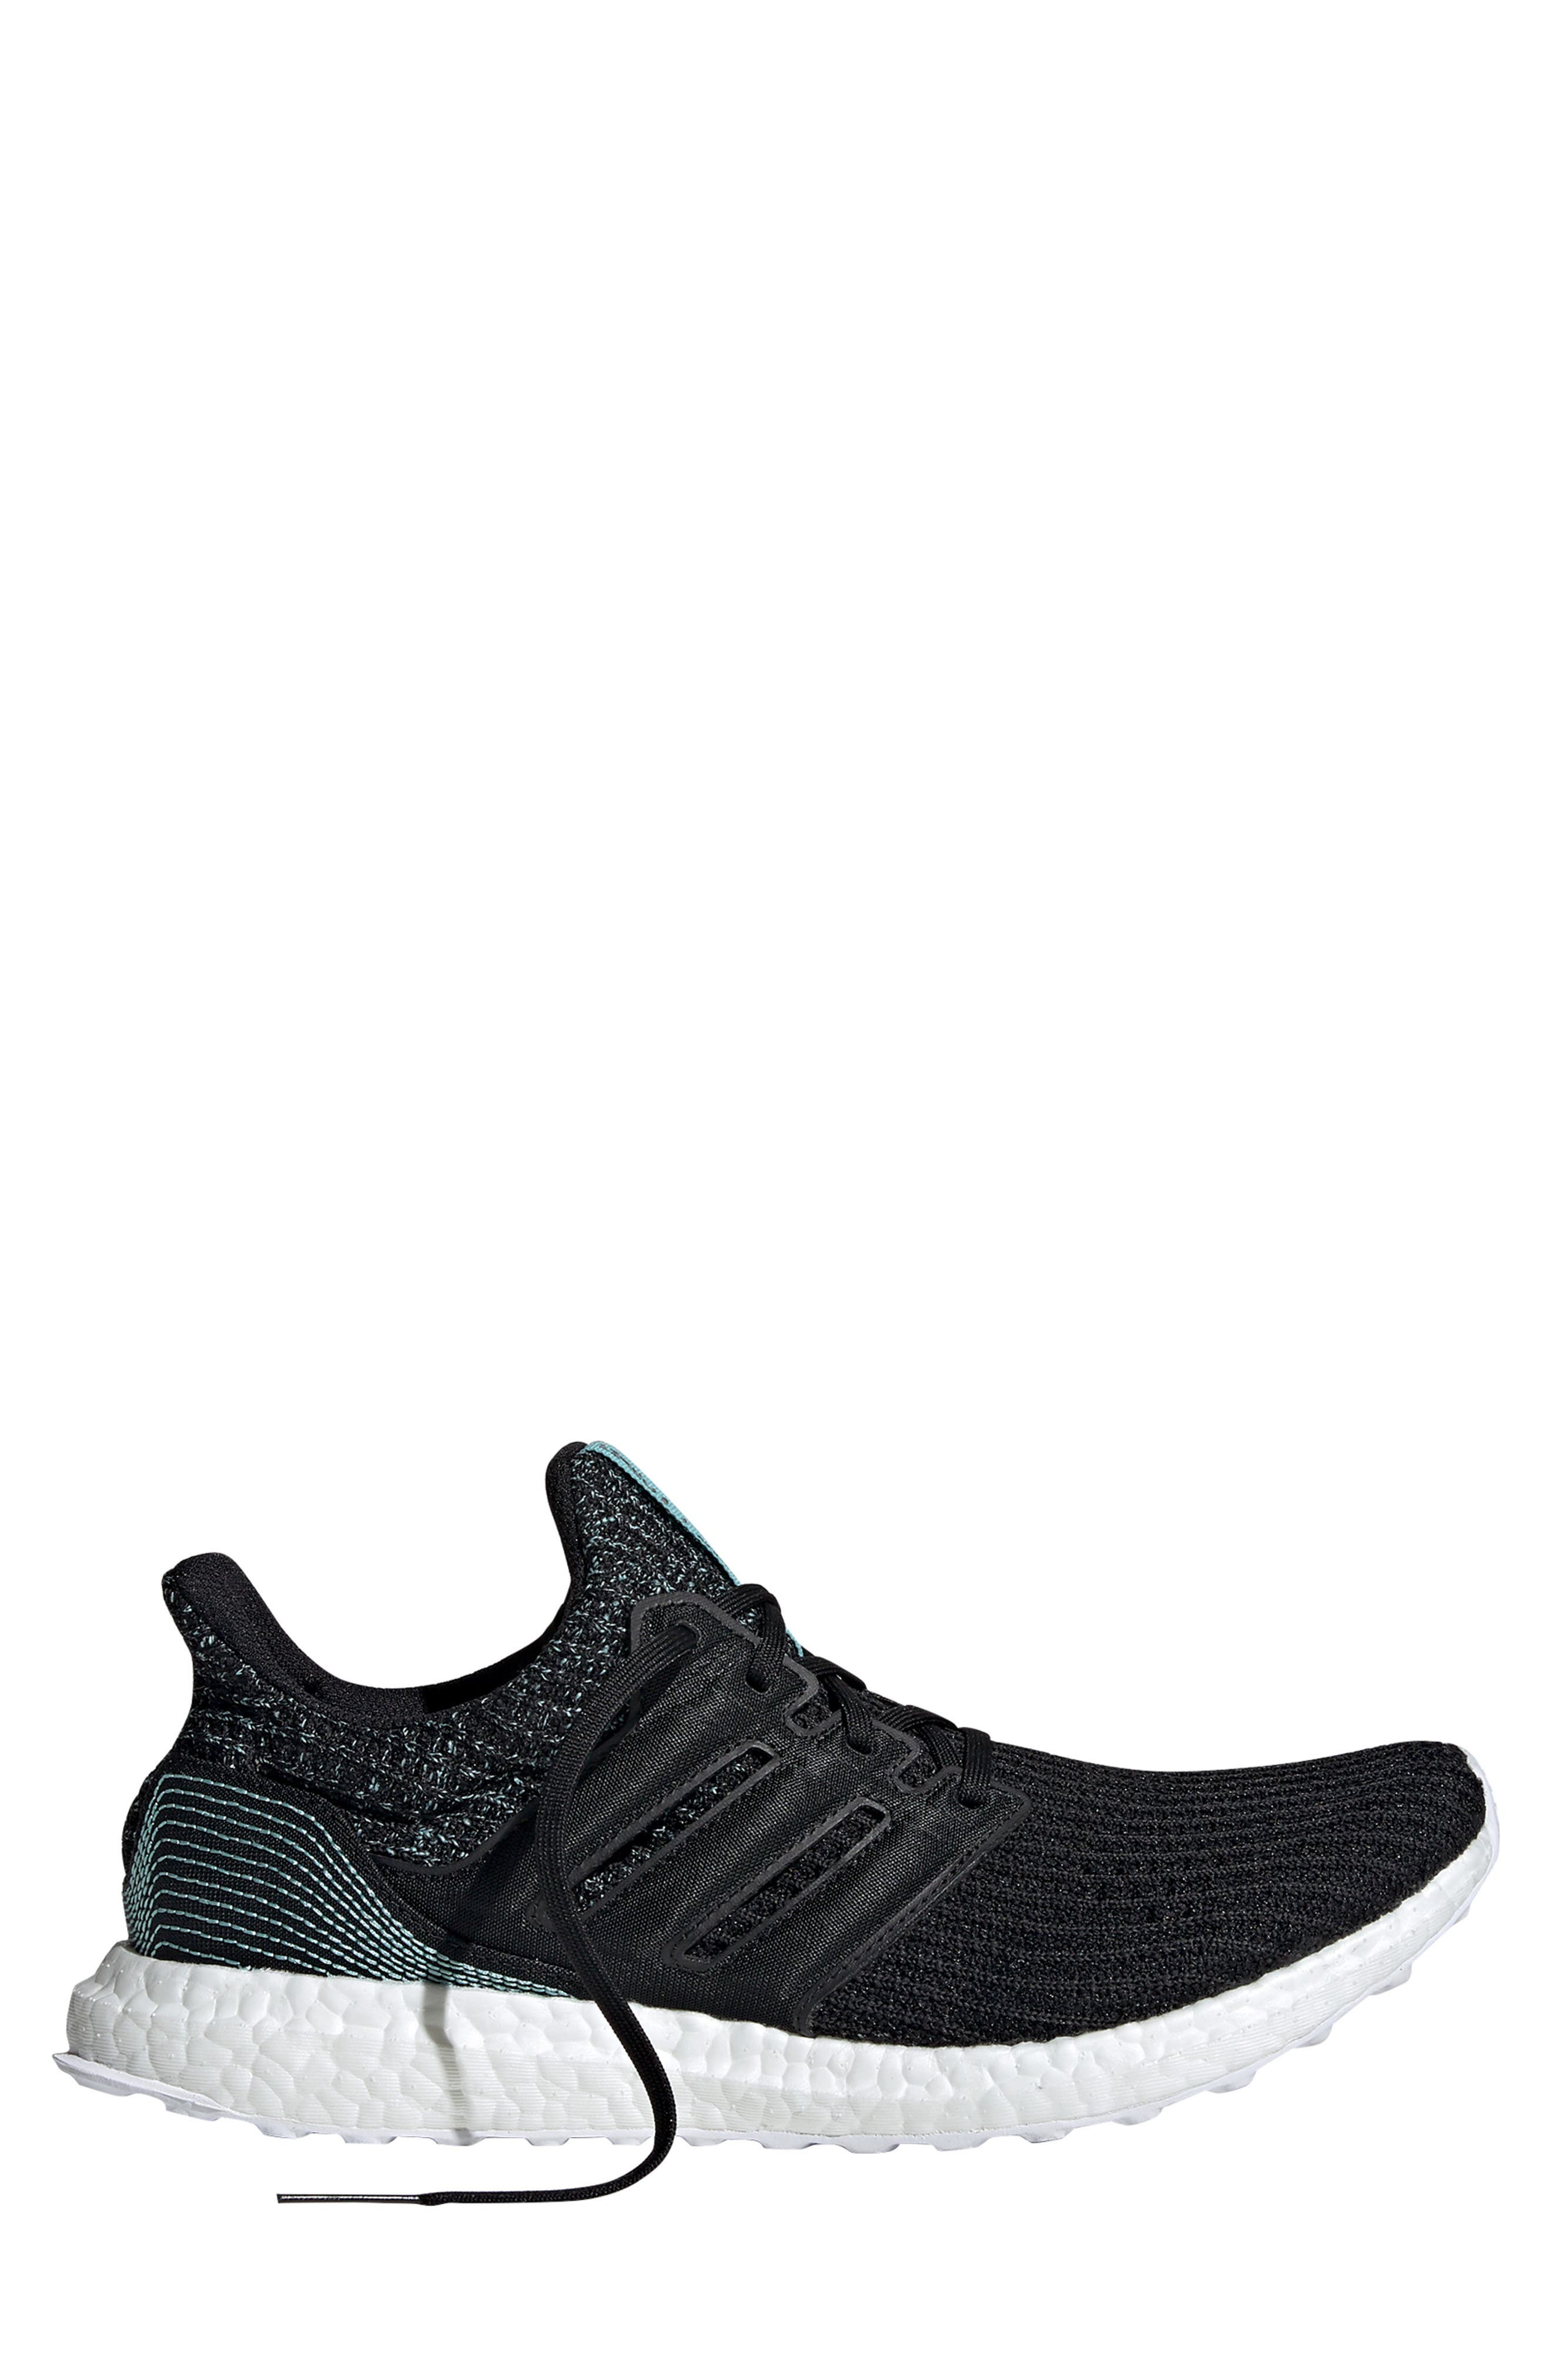 Parley UltraBoost Sneaker,                             Alternate thumbnail 8, color,                             001